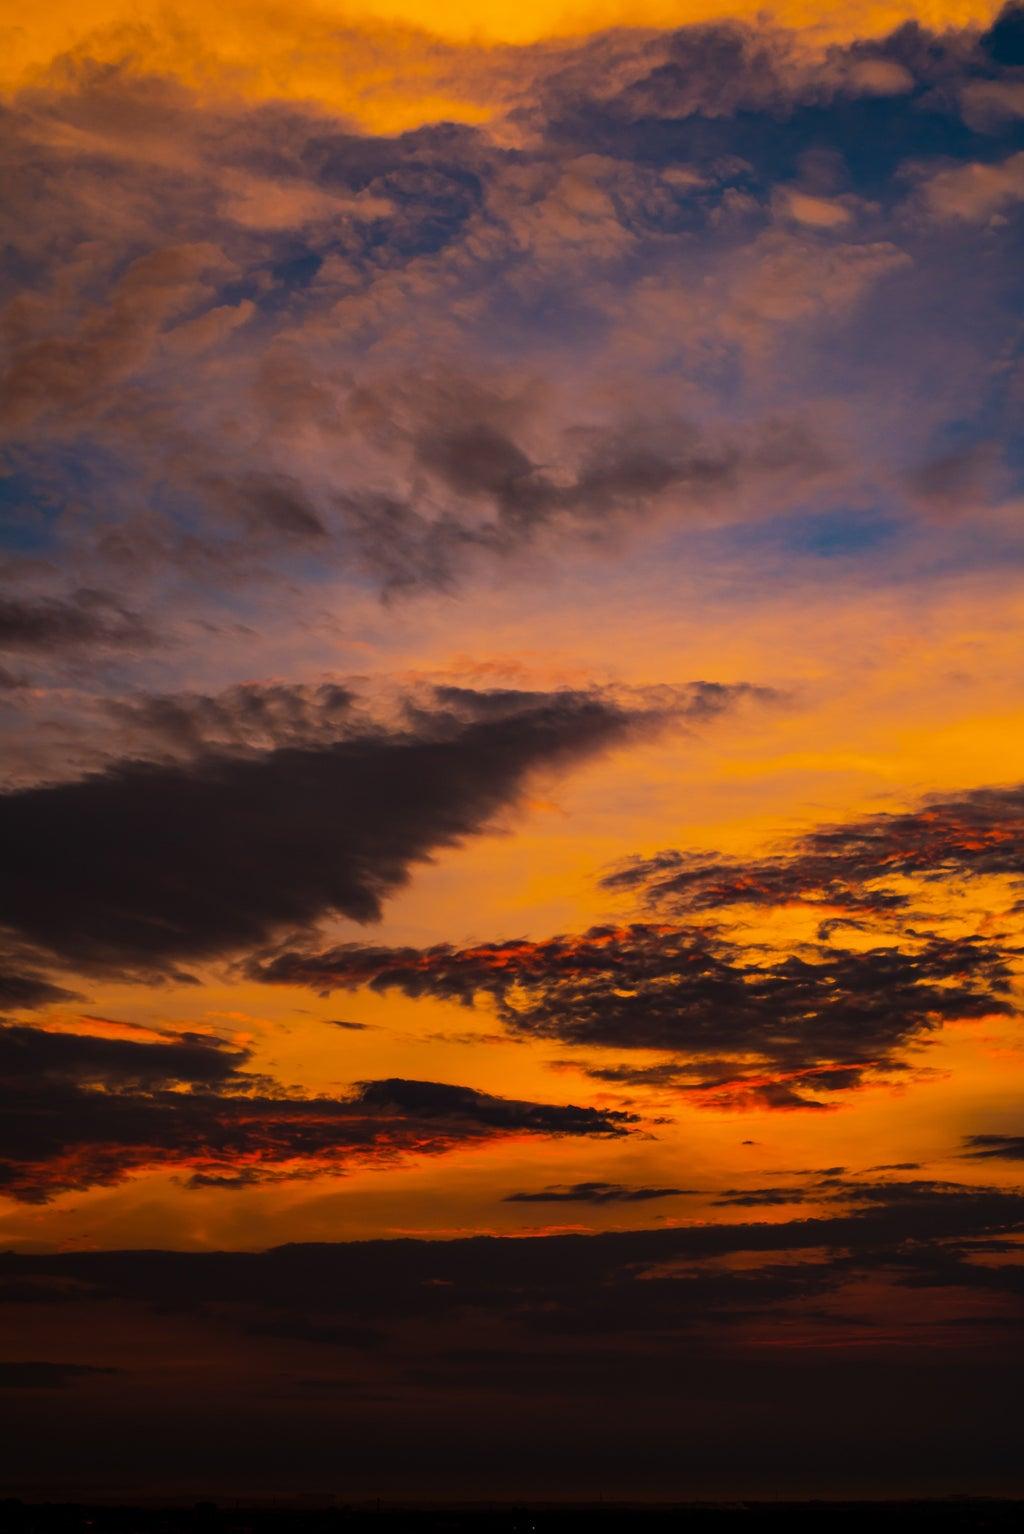 sky during golden hour